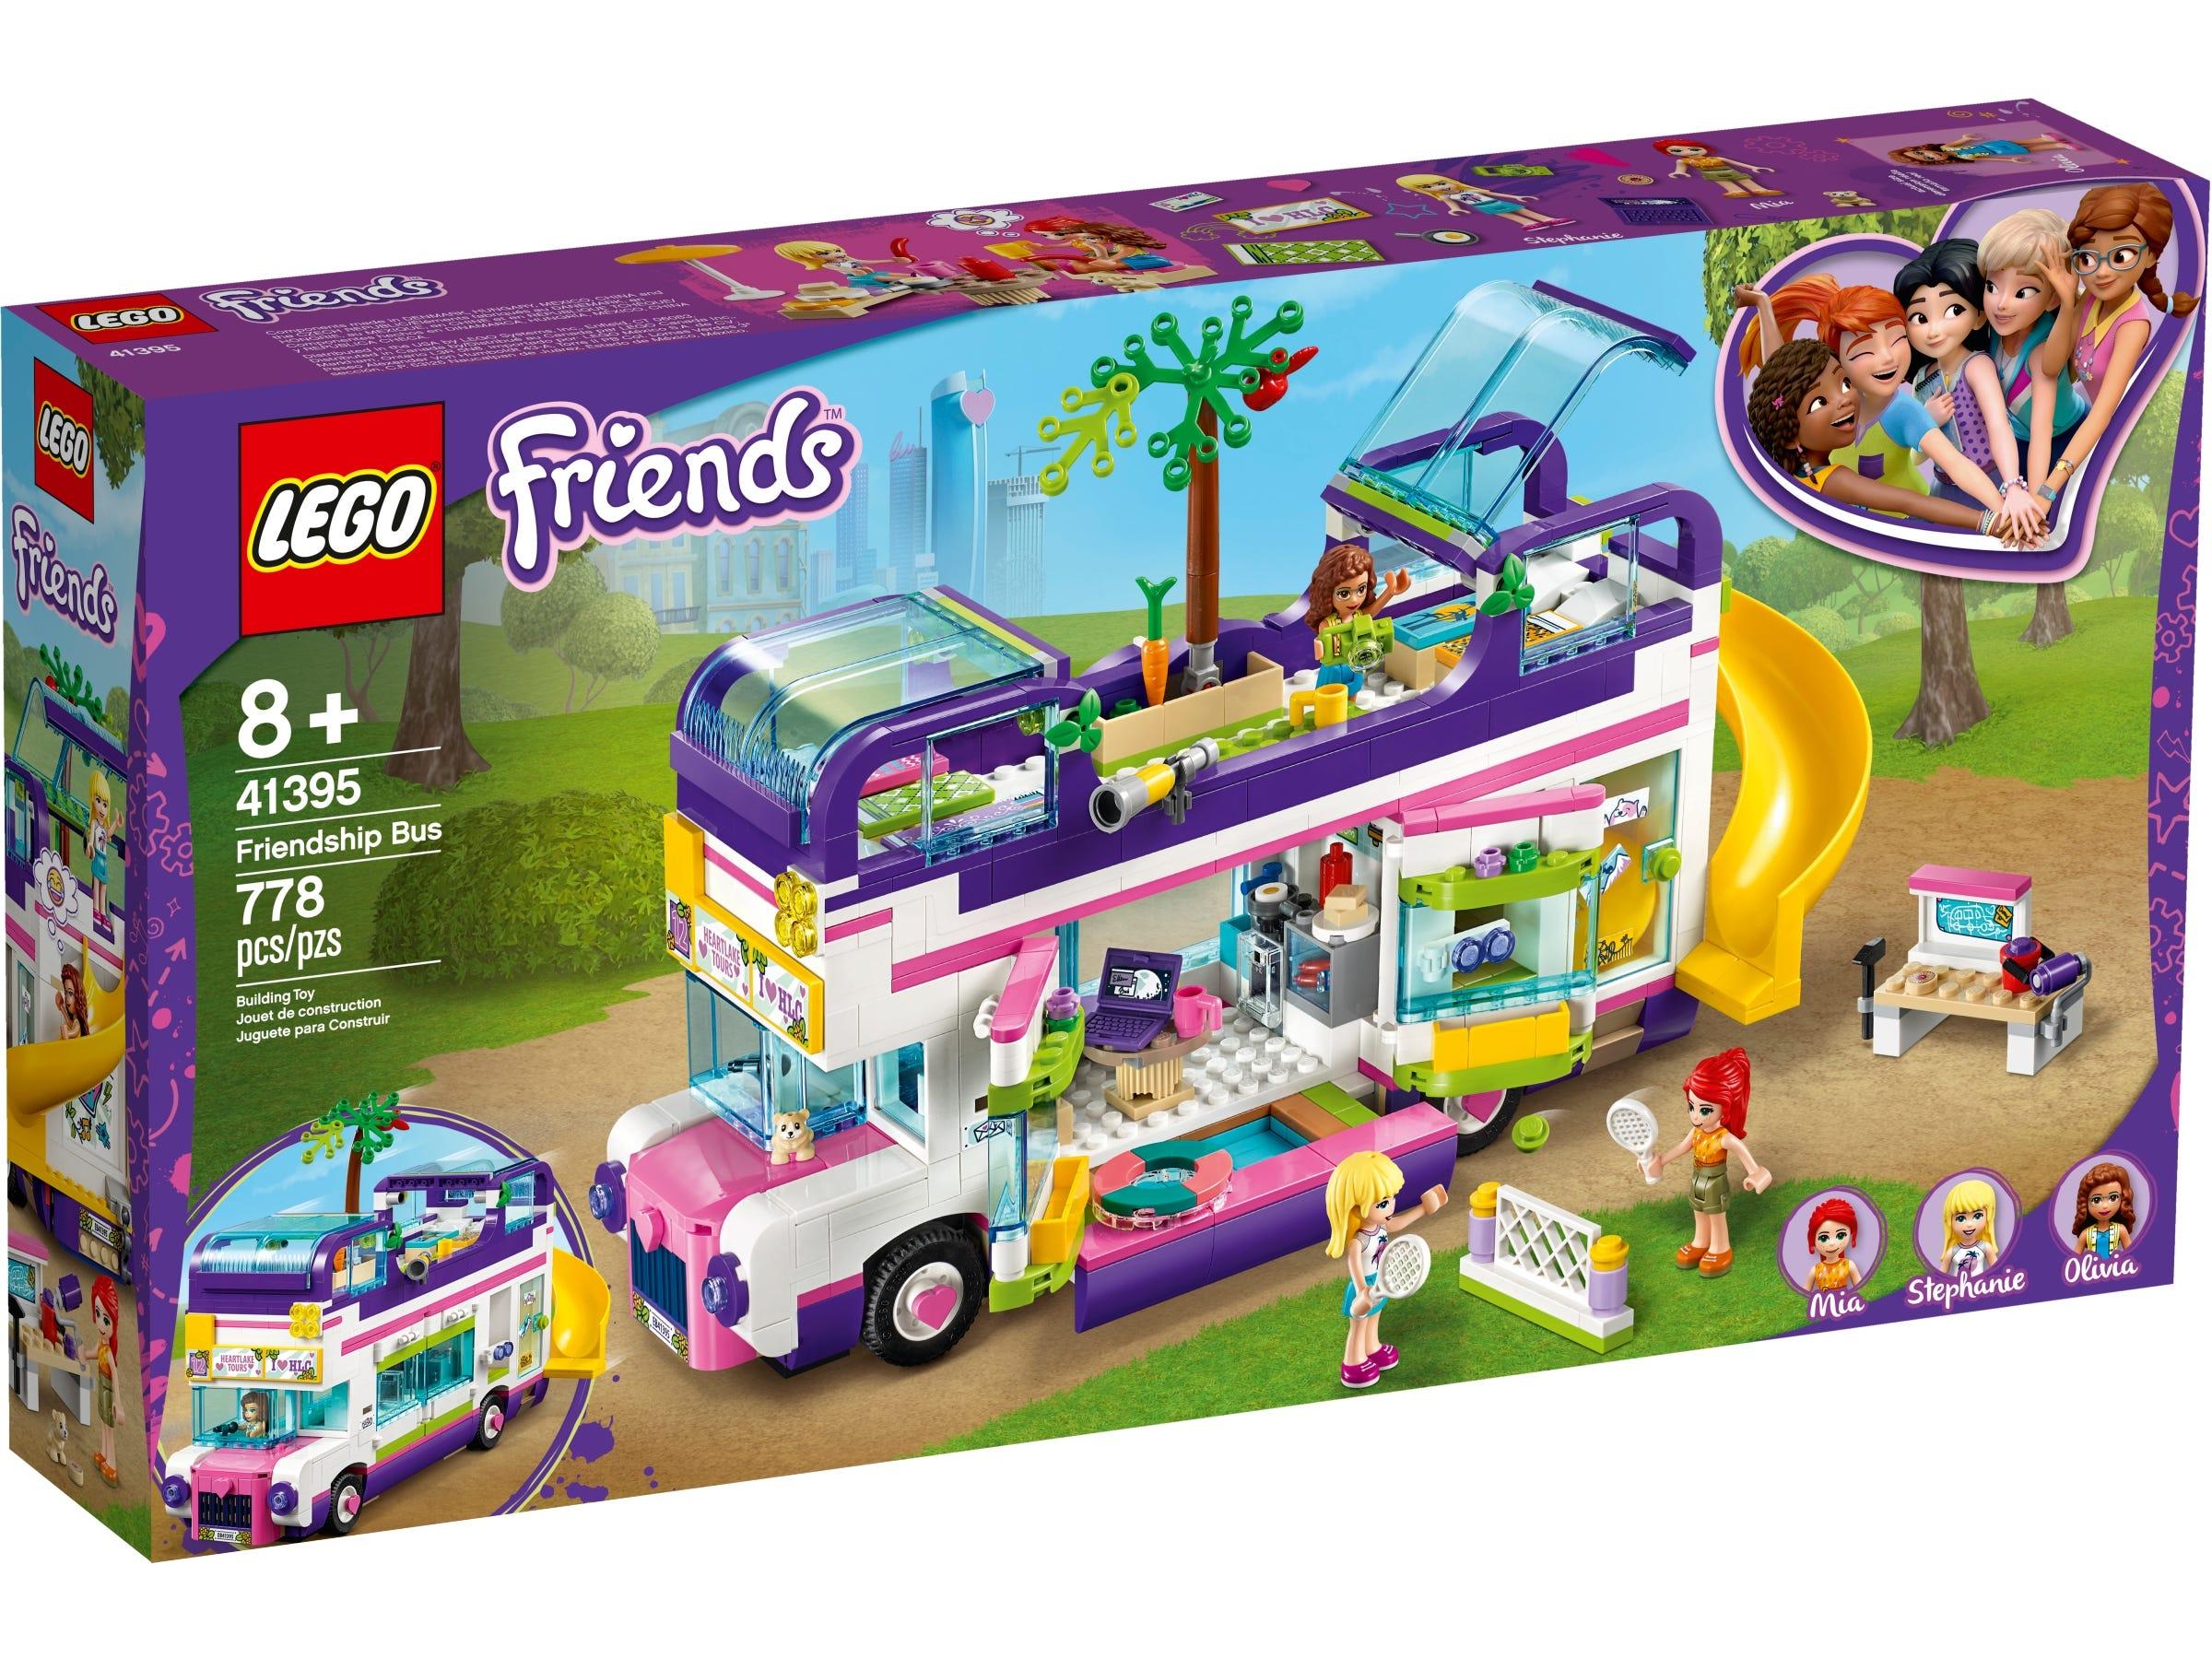 LEGO Friends - Friendship Bus (41395)